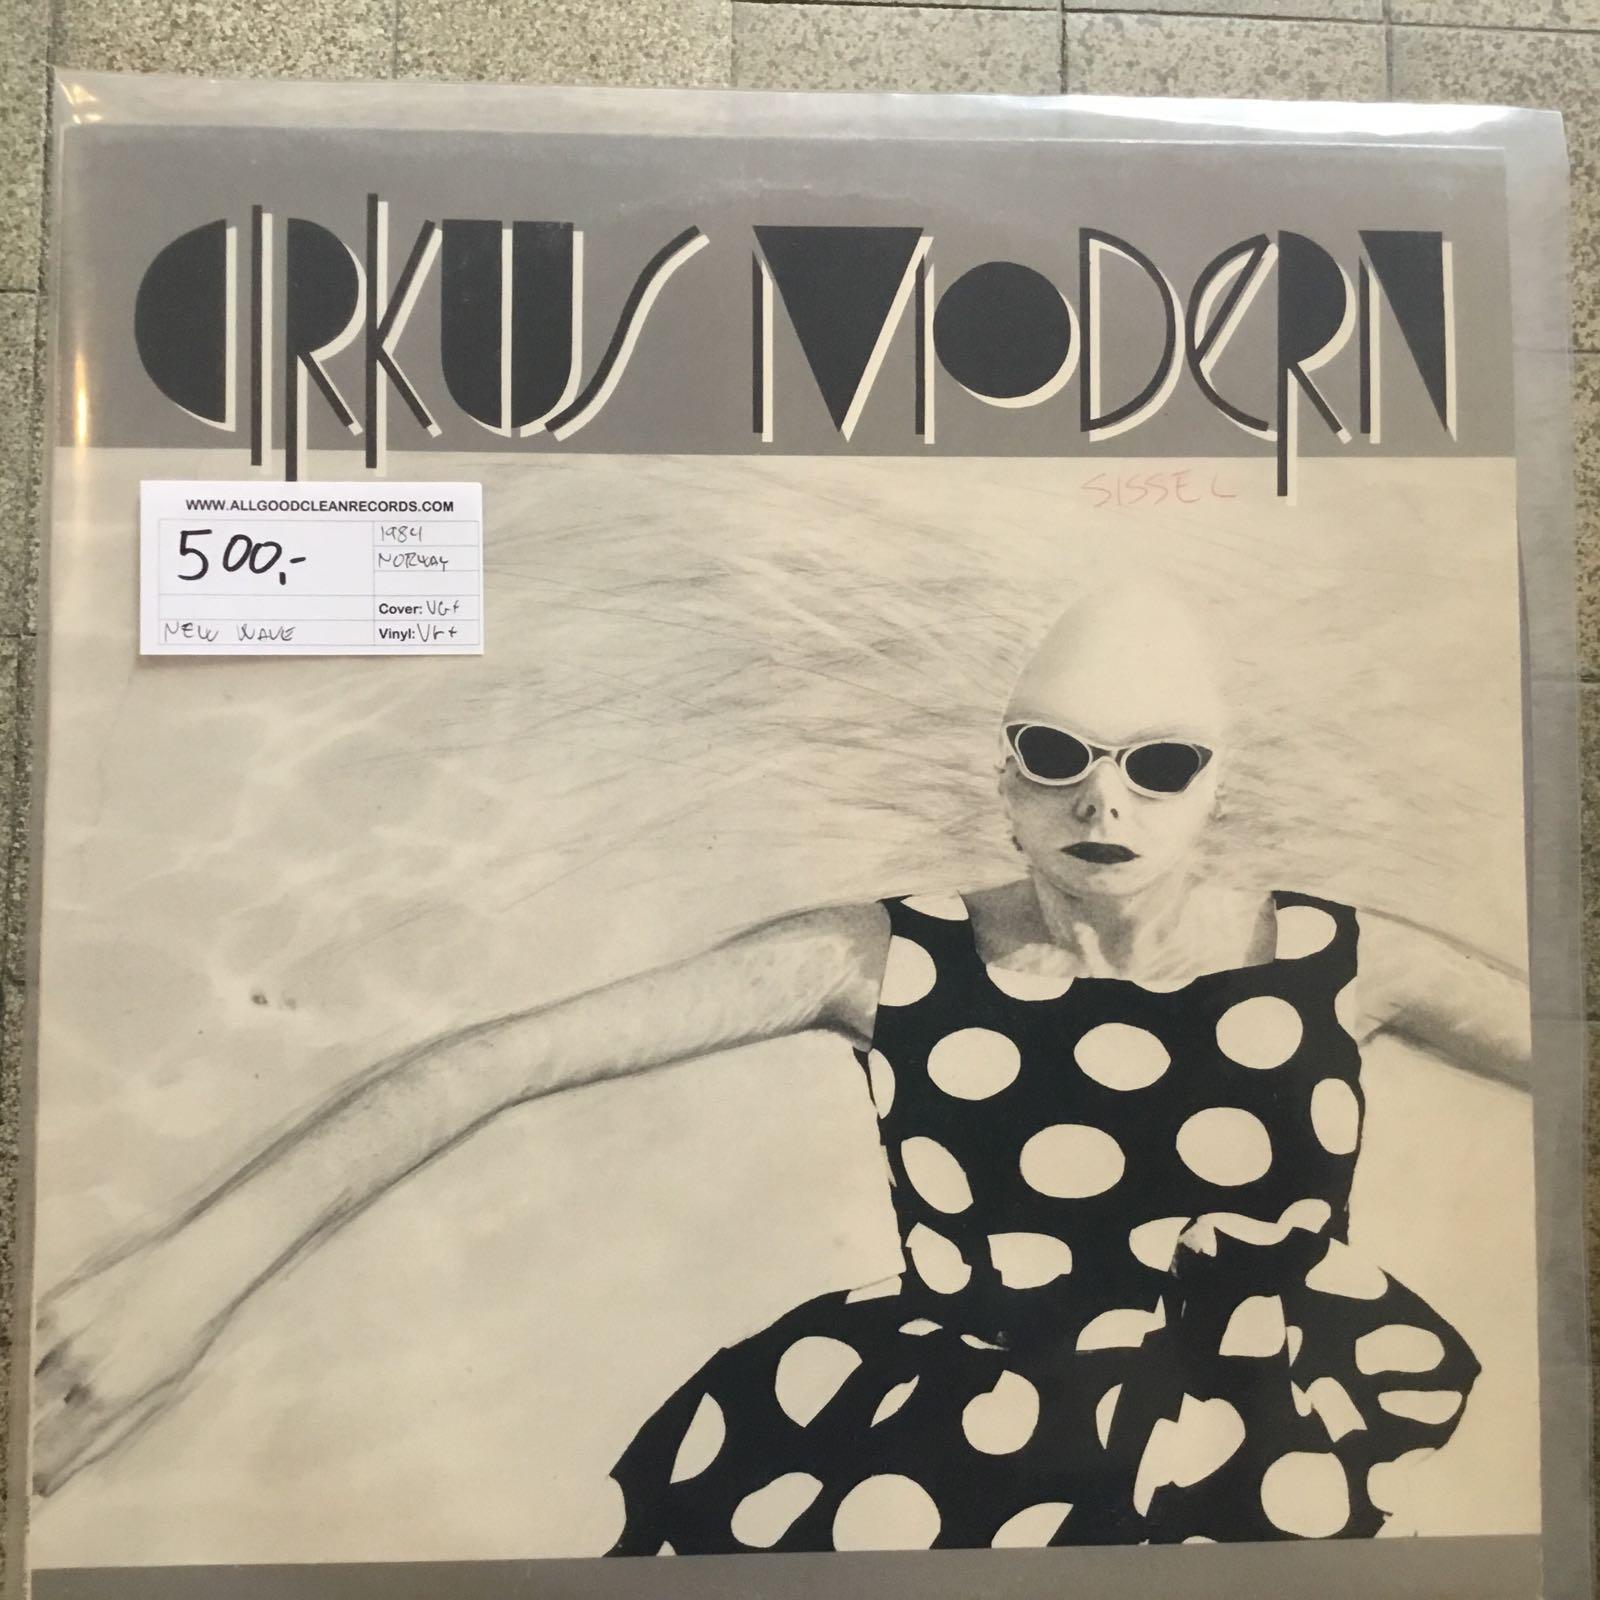 Cirkus Modern – Cirkus Modern [LP] (2. hand)